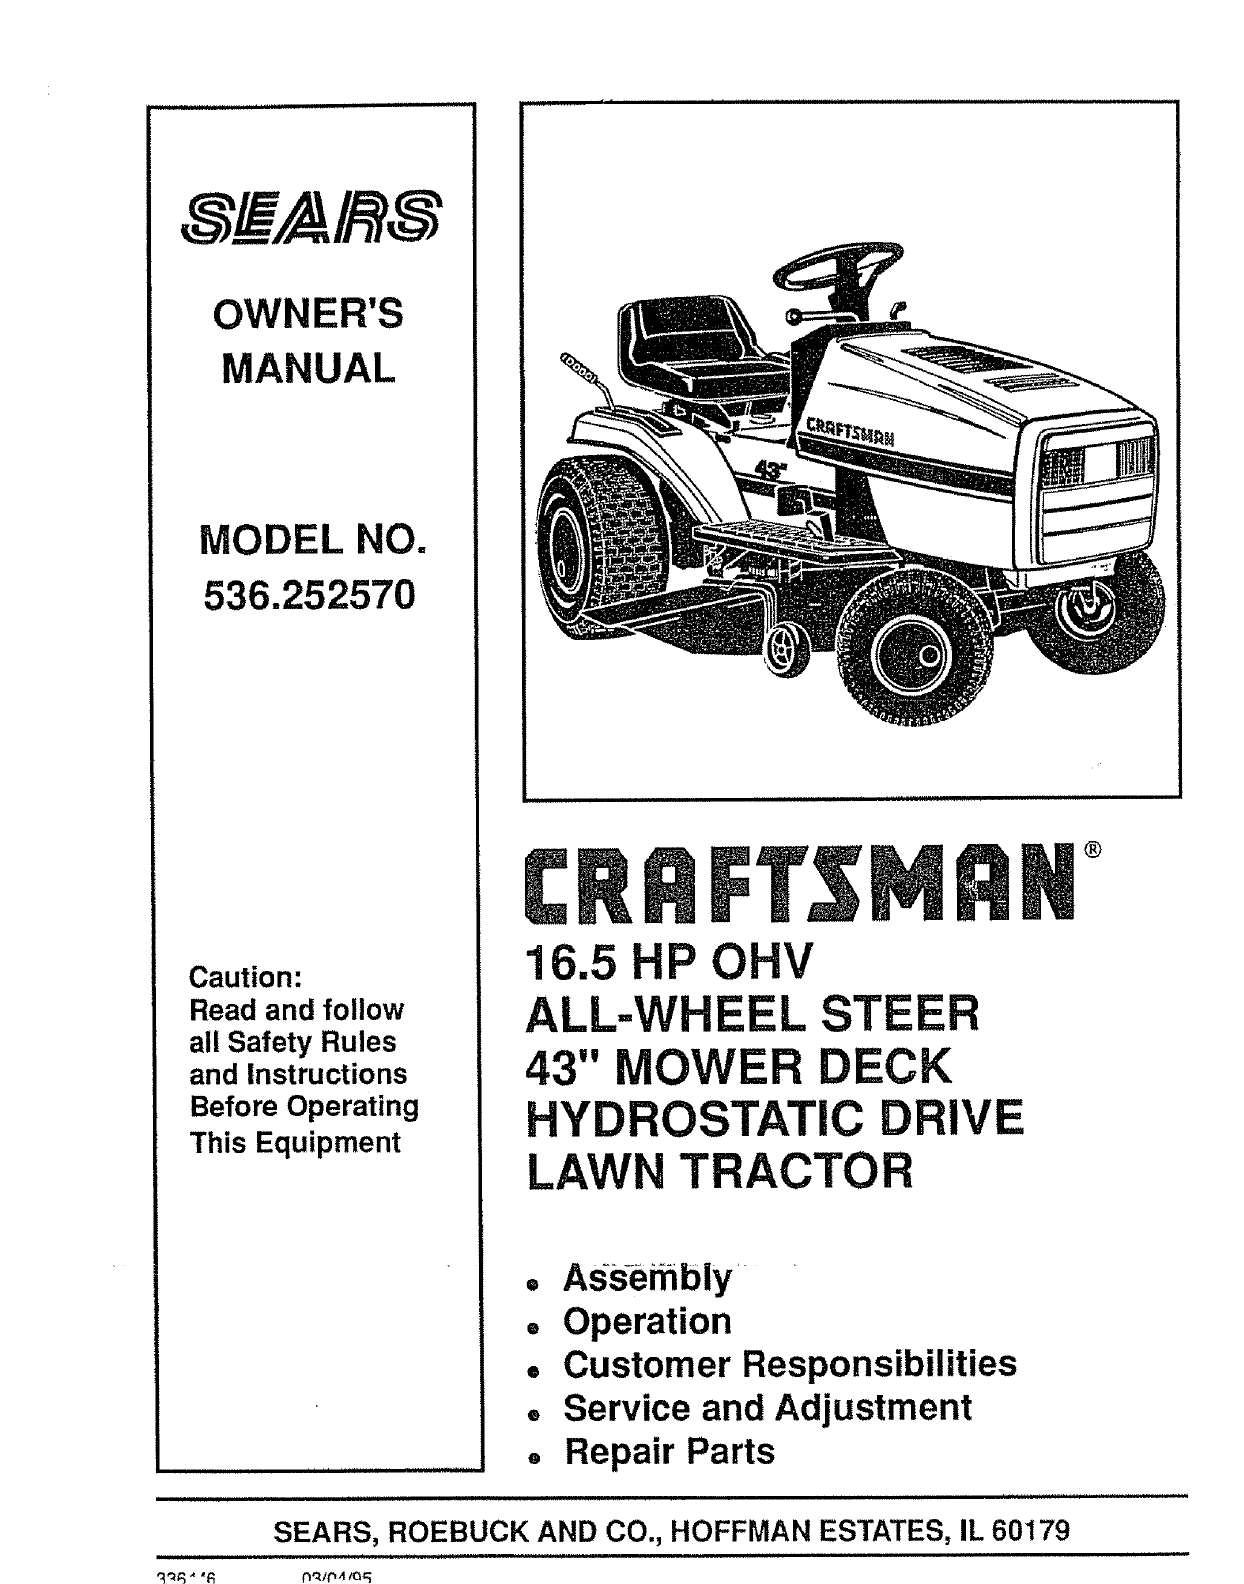 Craftsman 536252570 User Manual HYDROSTATIC DRIVE TRACTOR